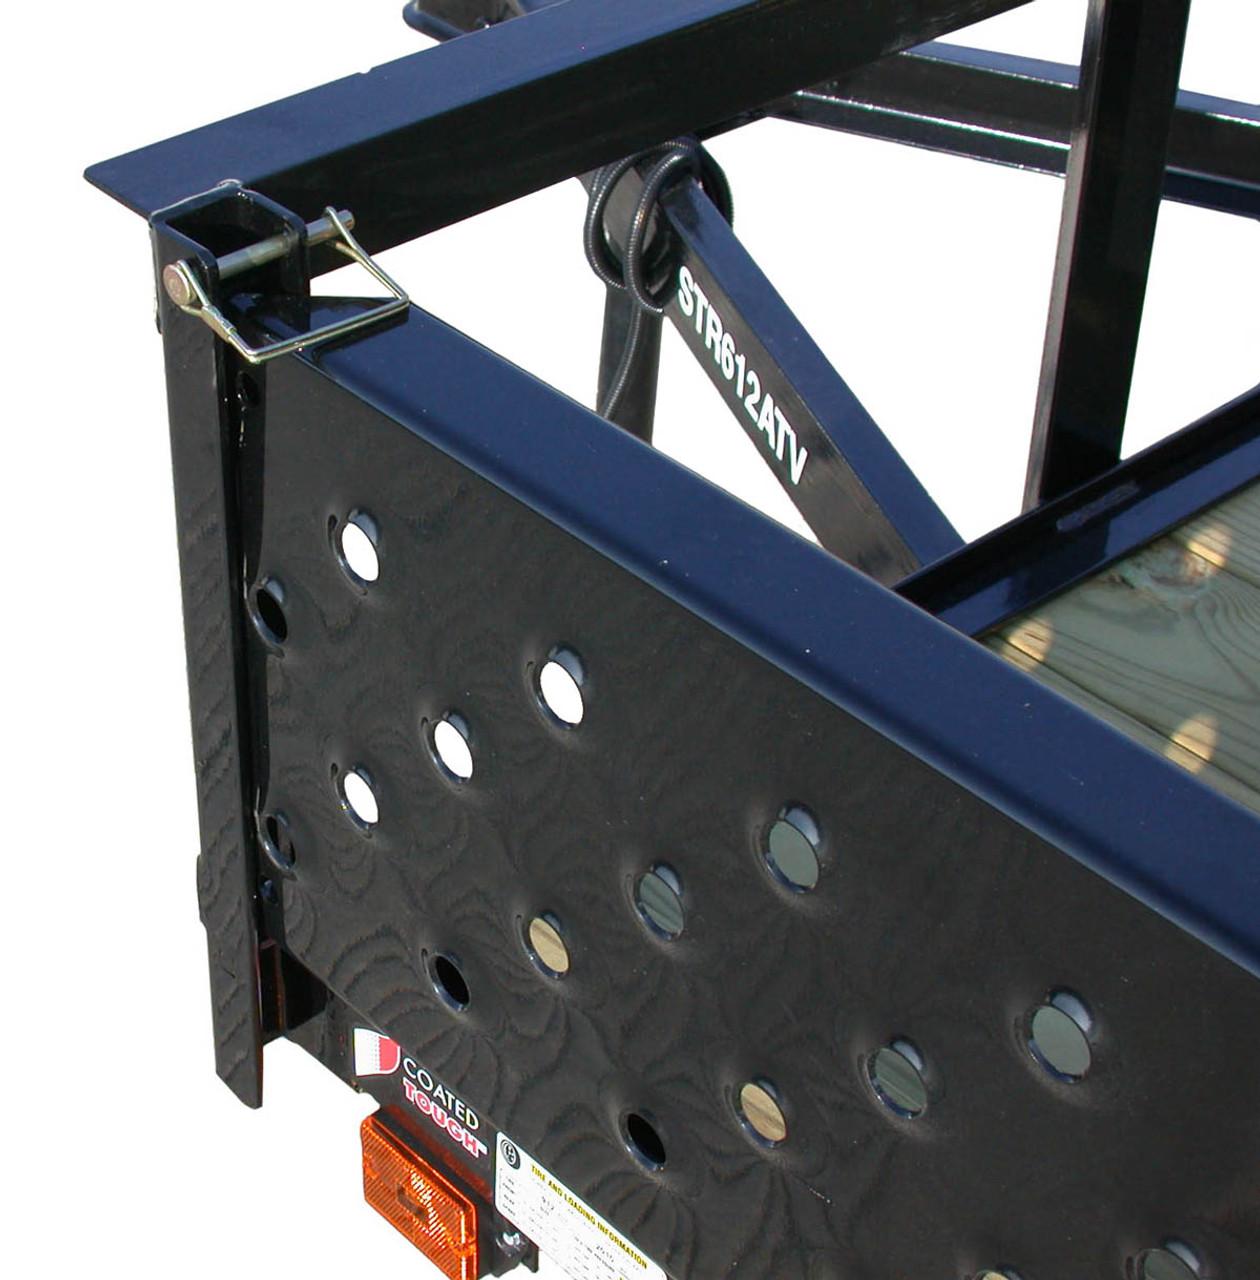 STR712GT-ATV --- 7' x 12' ATV Trailer with ATV Ramps